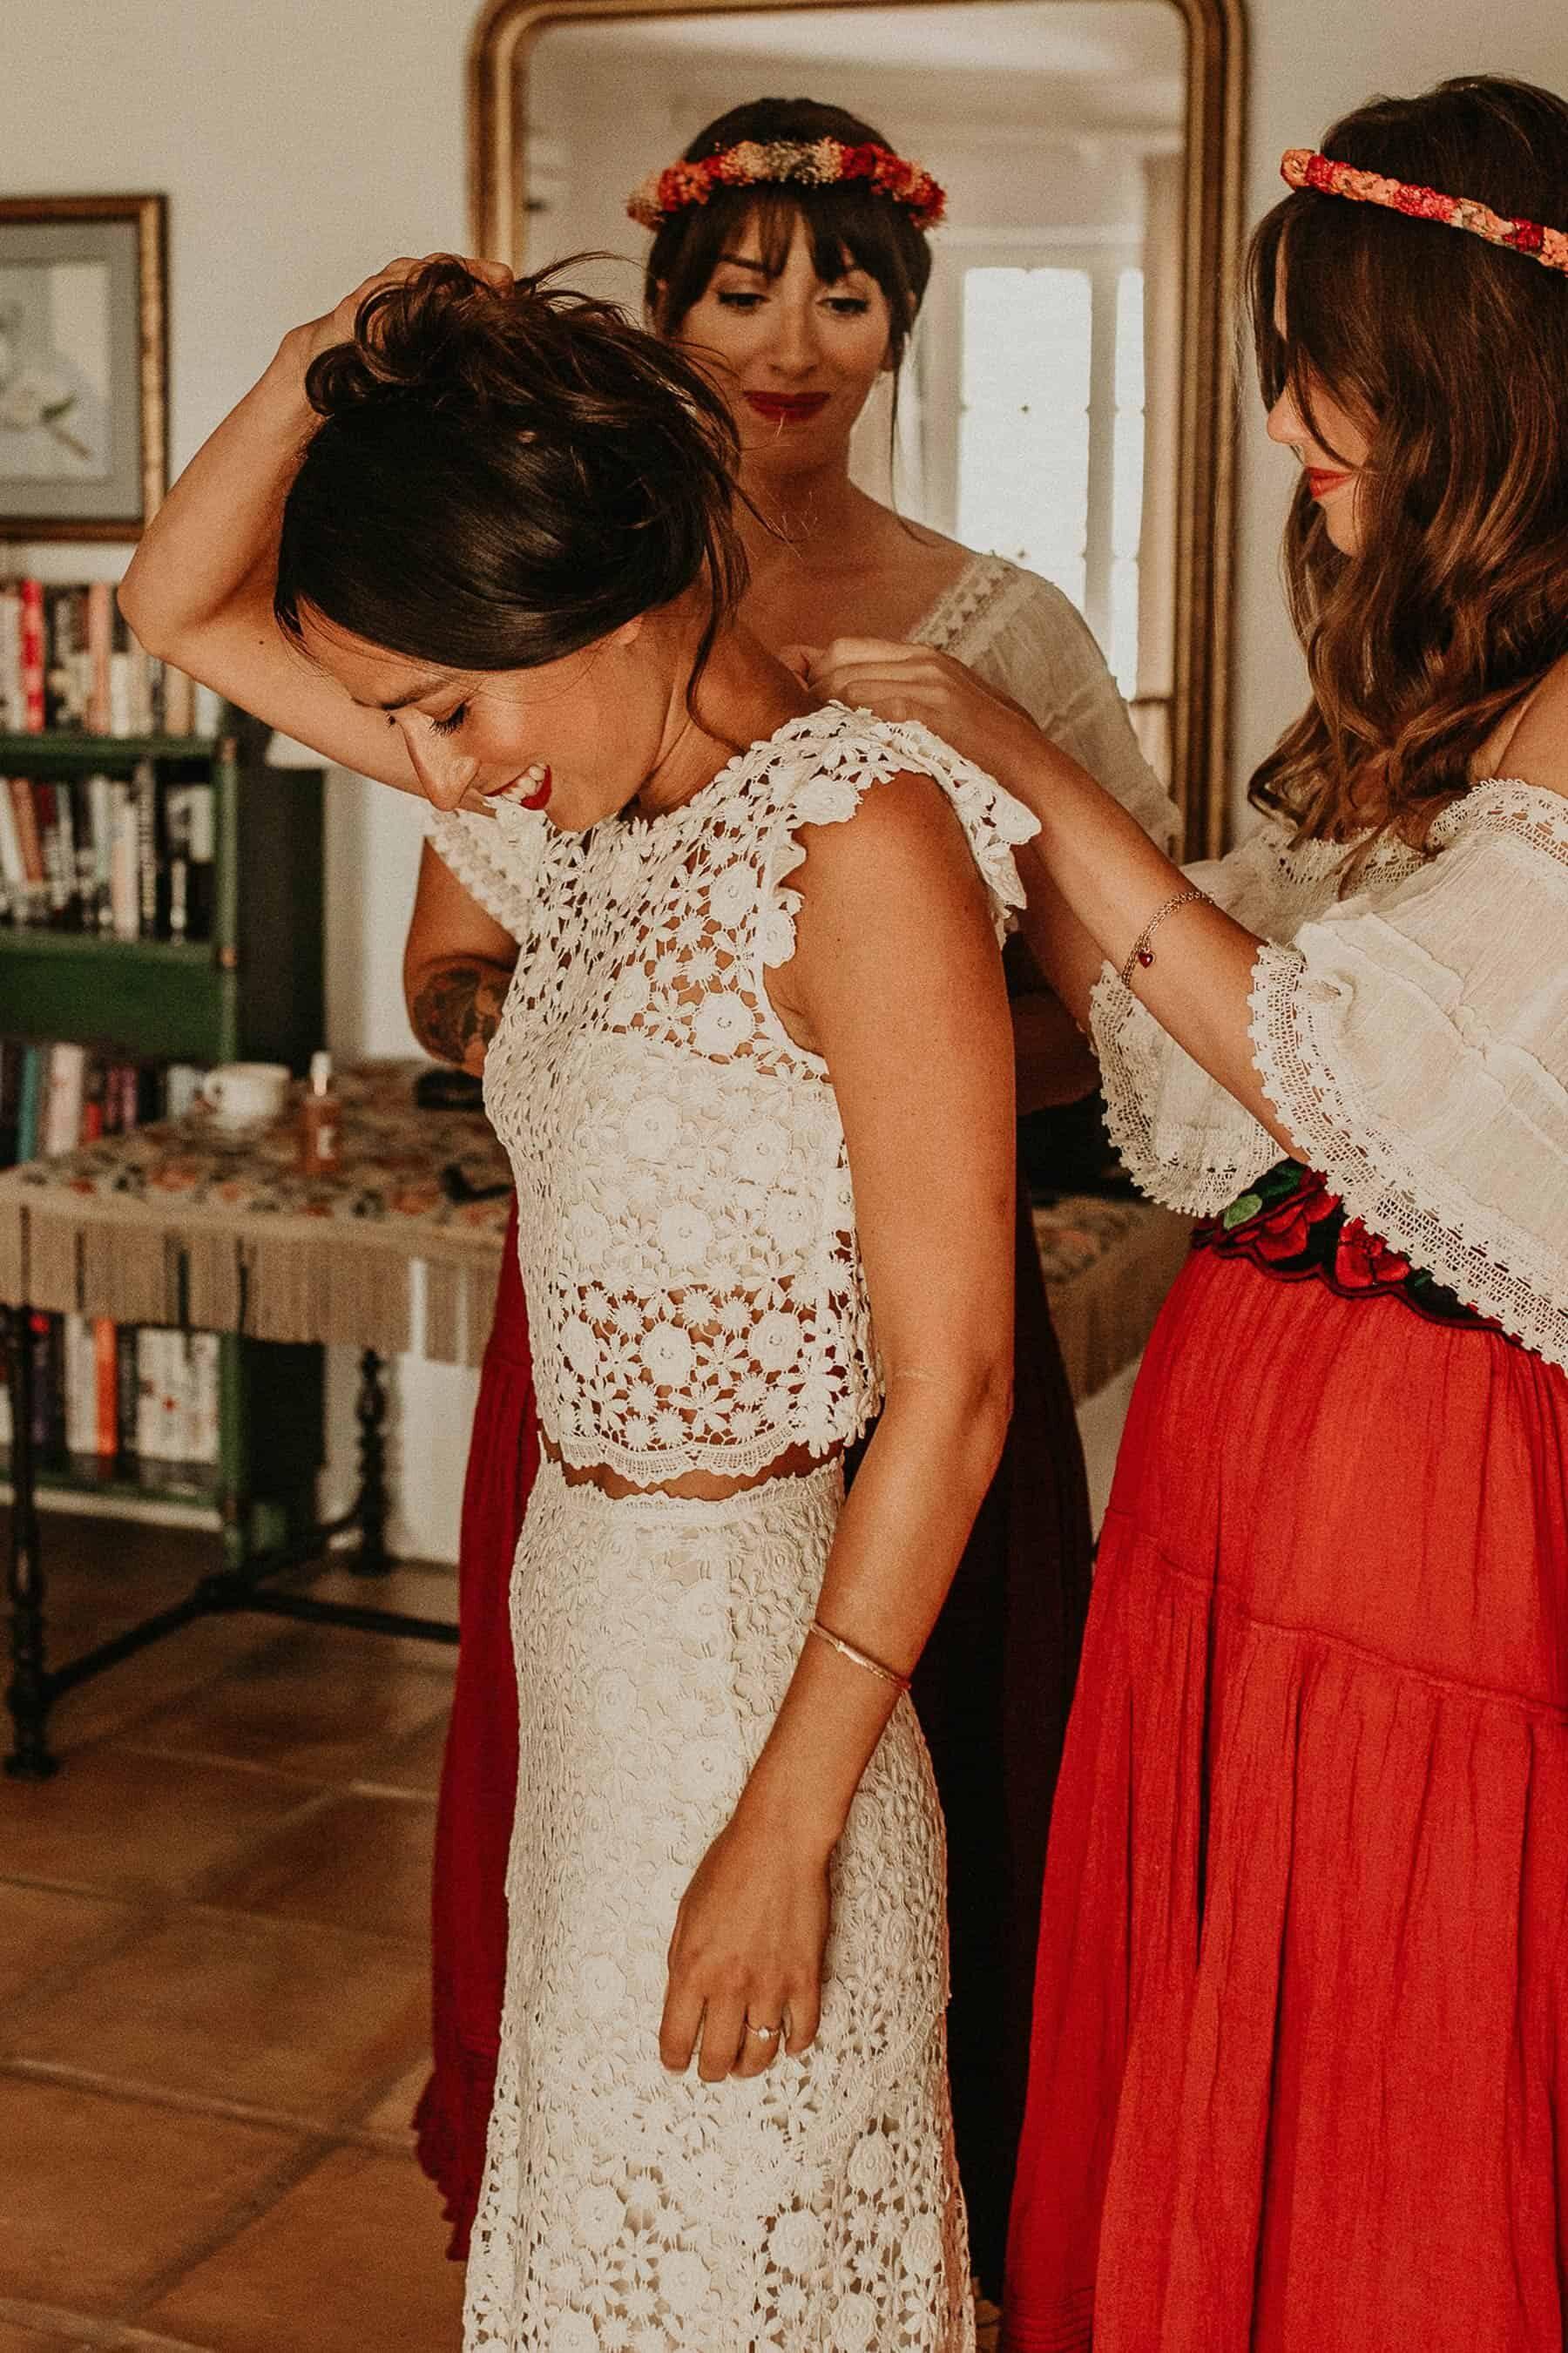 boho bride in two piece crochet wedding dress and Frida Kahlo flower crown